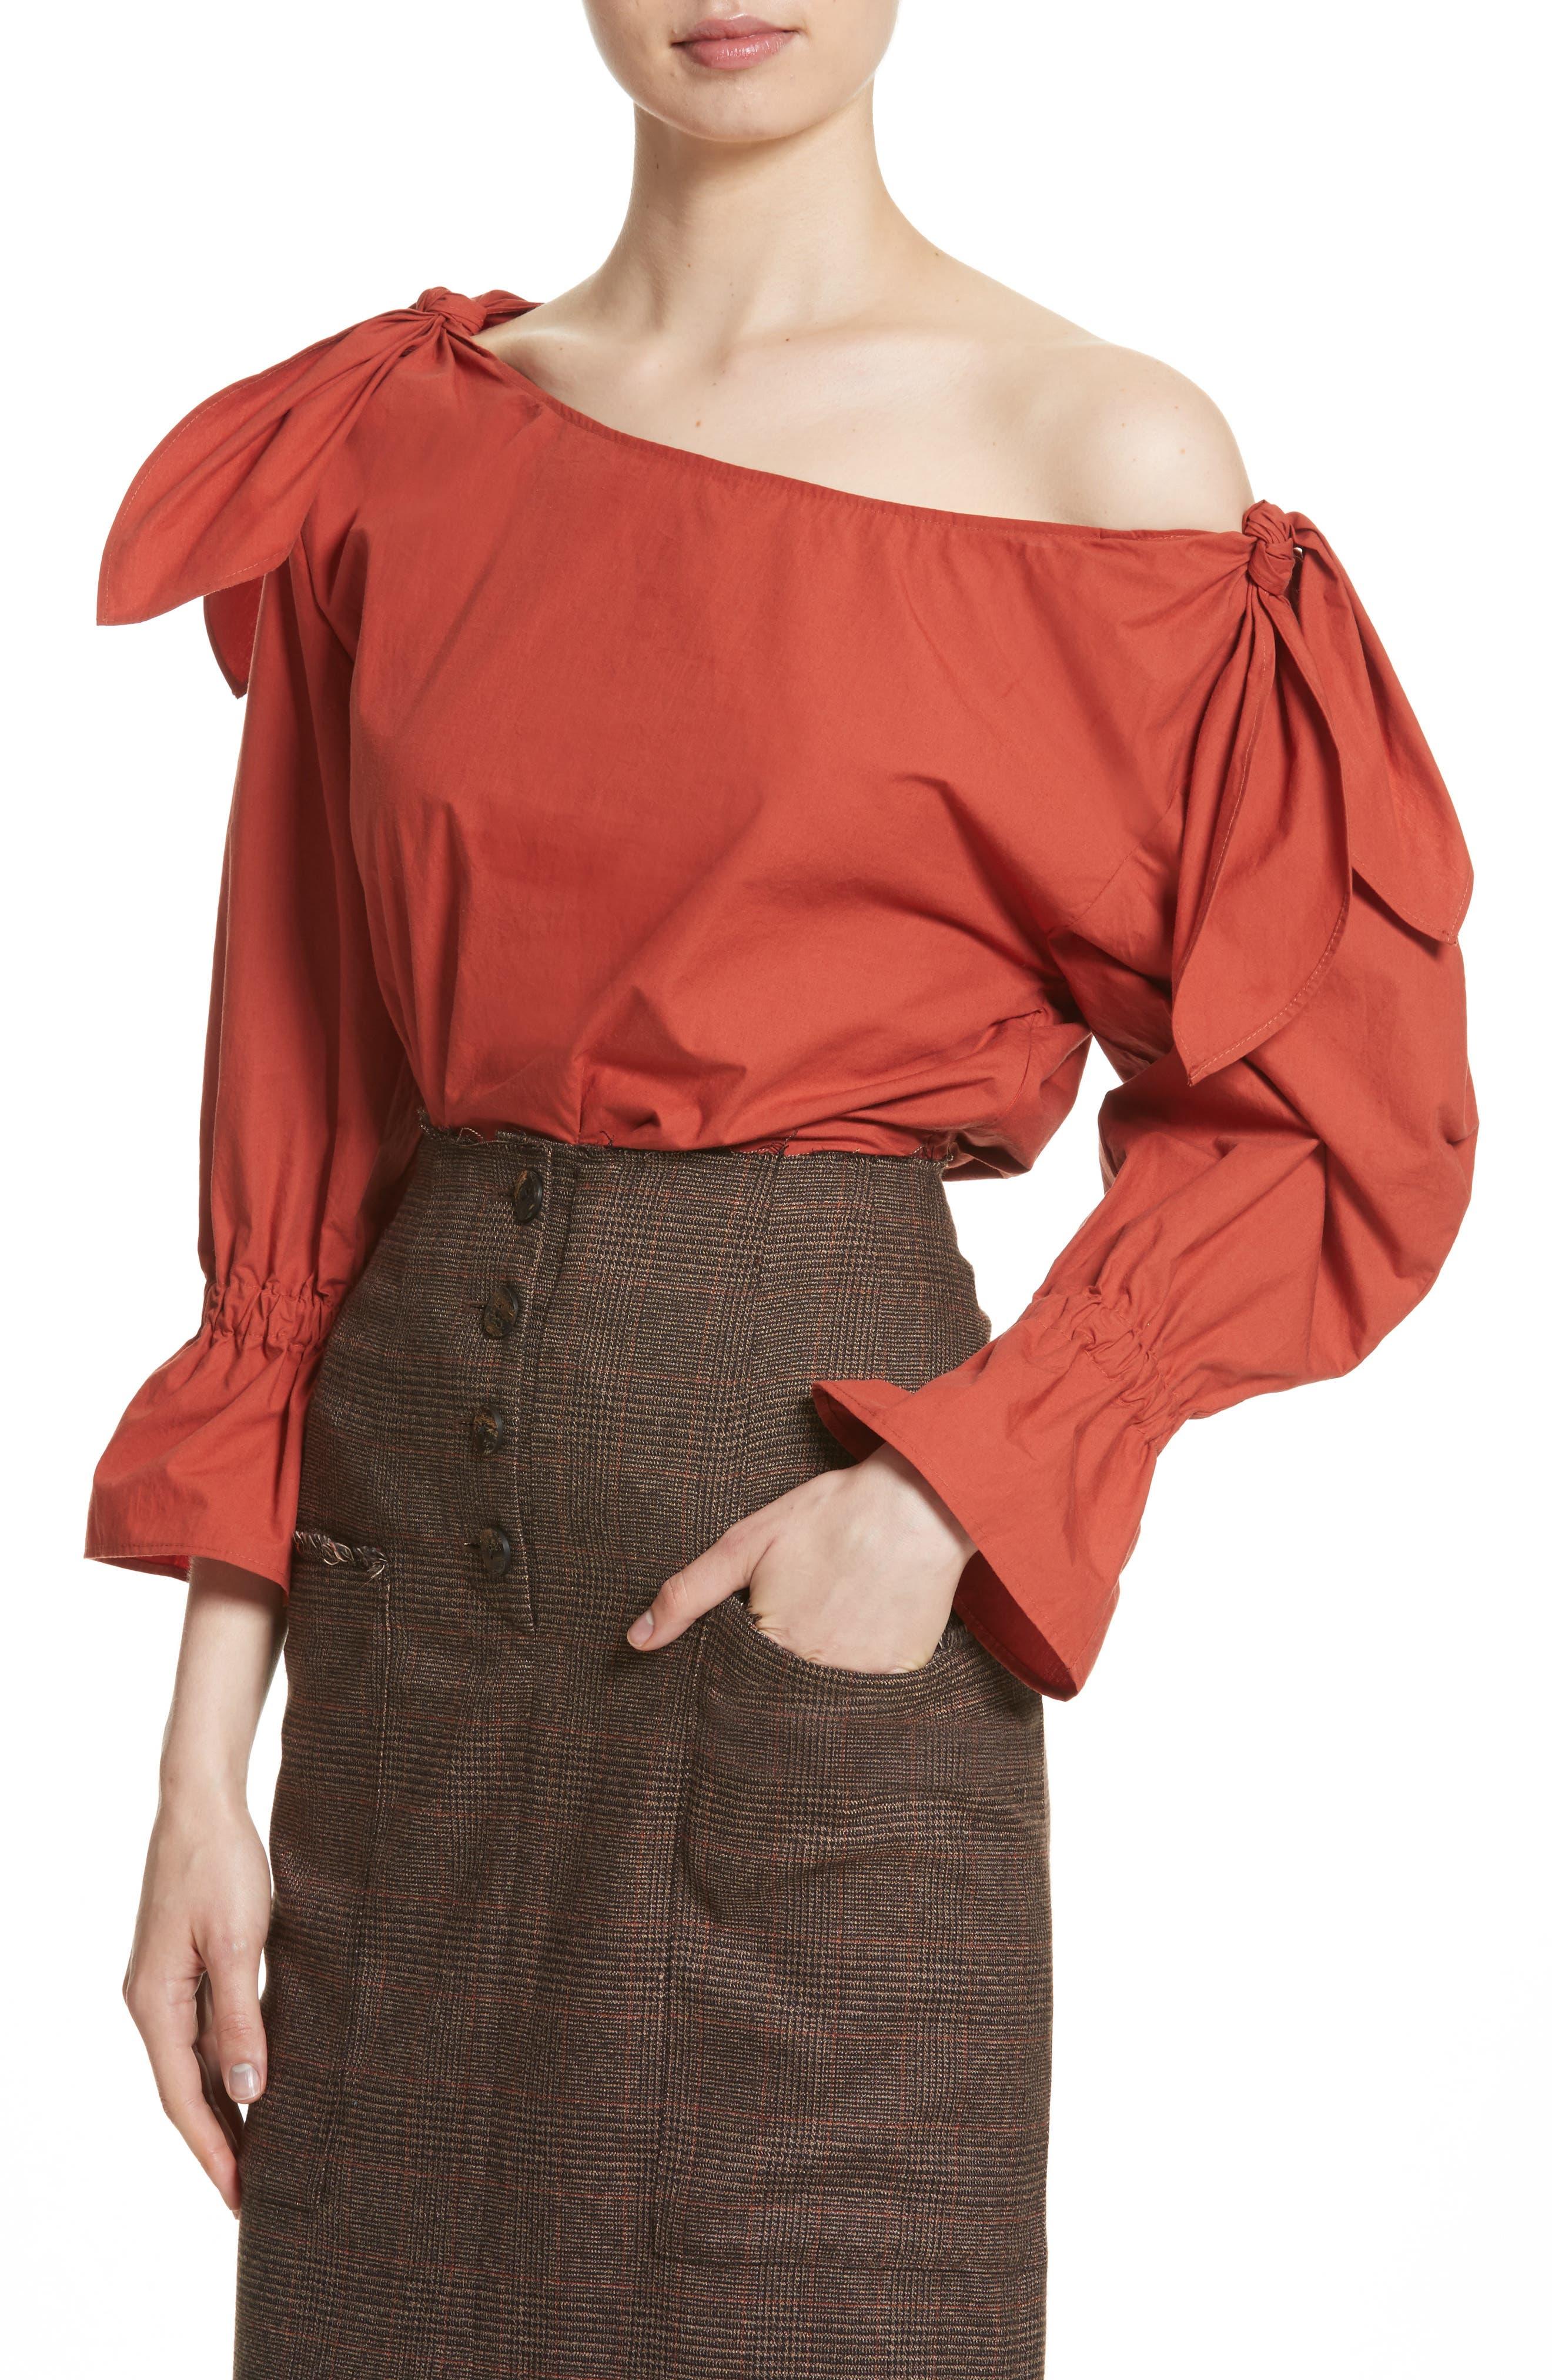 Michelle One-Shoulder Puff Sleeve Blouse,                             Alternate thumbnail 4, color,                             810